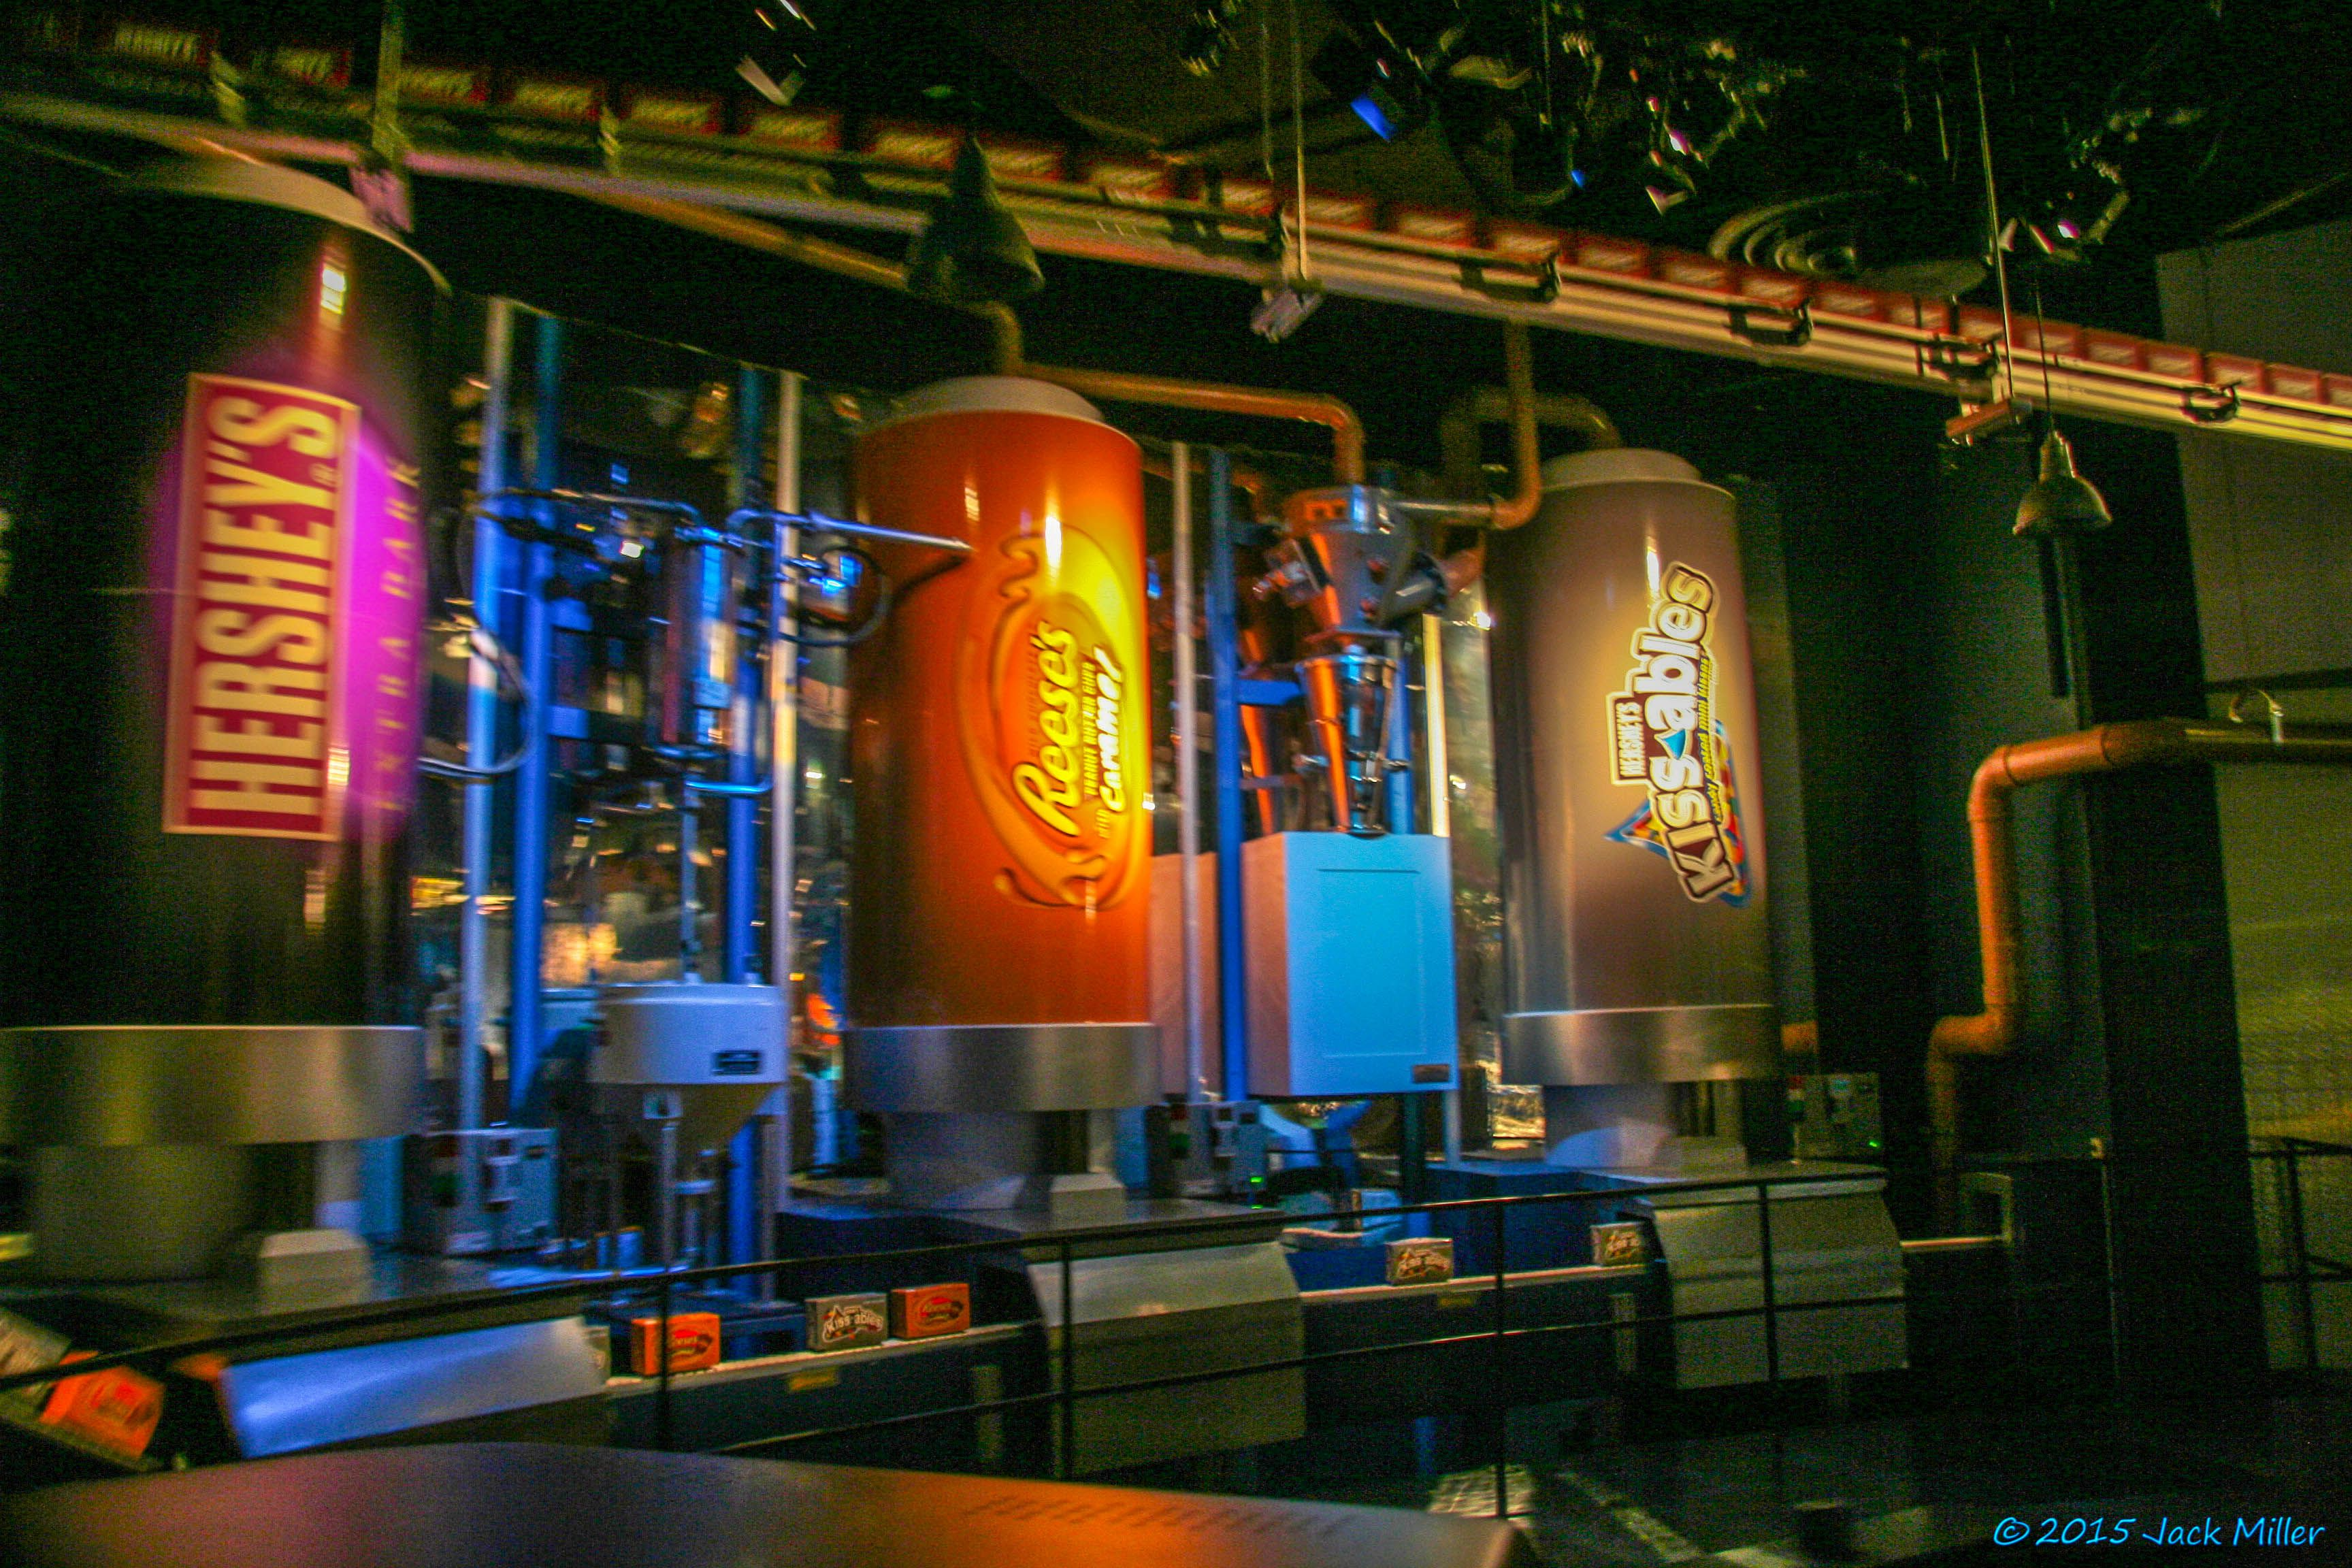 Hershey's Chocolate Factory Tour